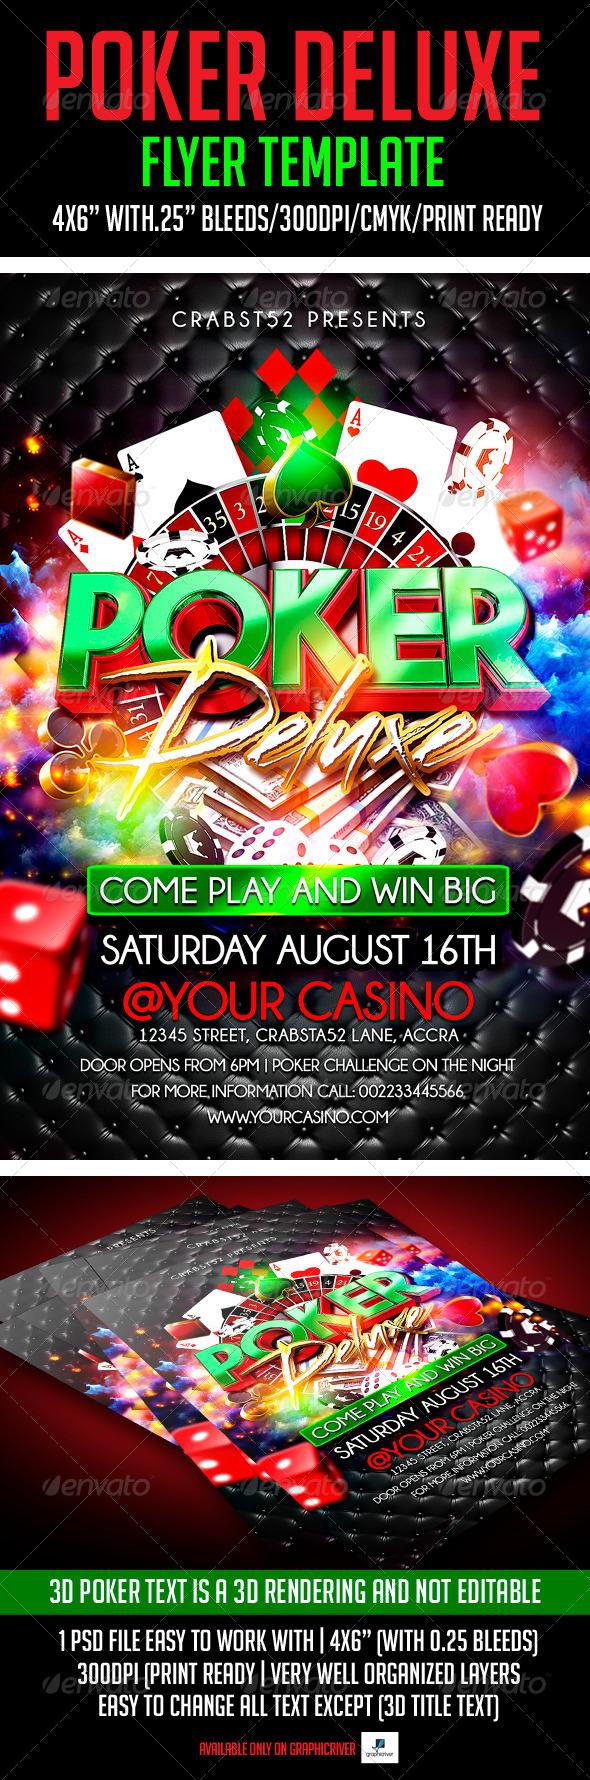 Poker Deluxe Flyer Template